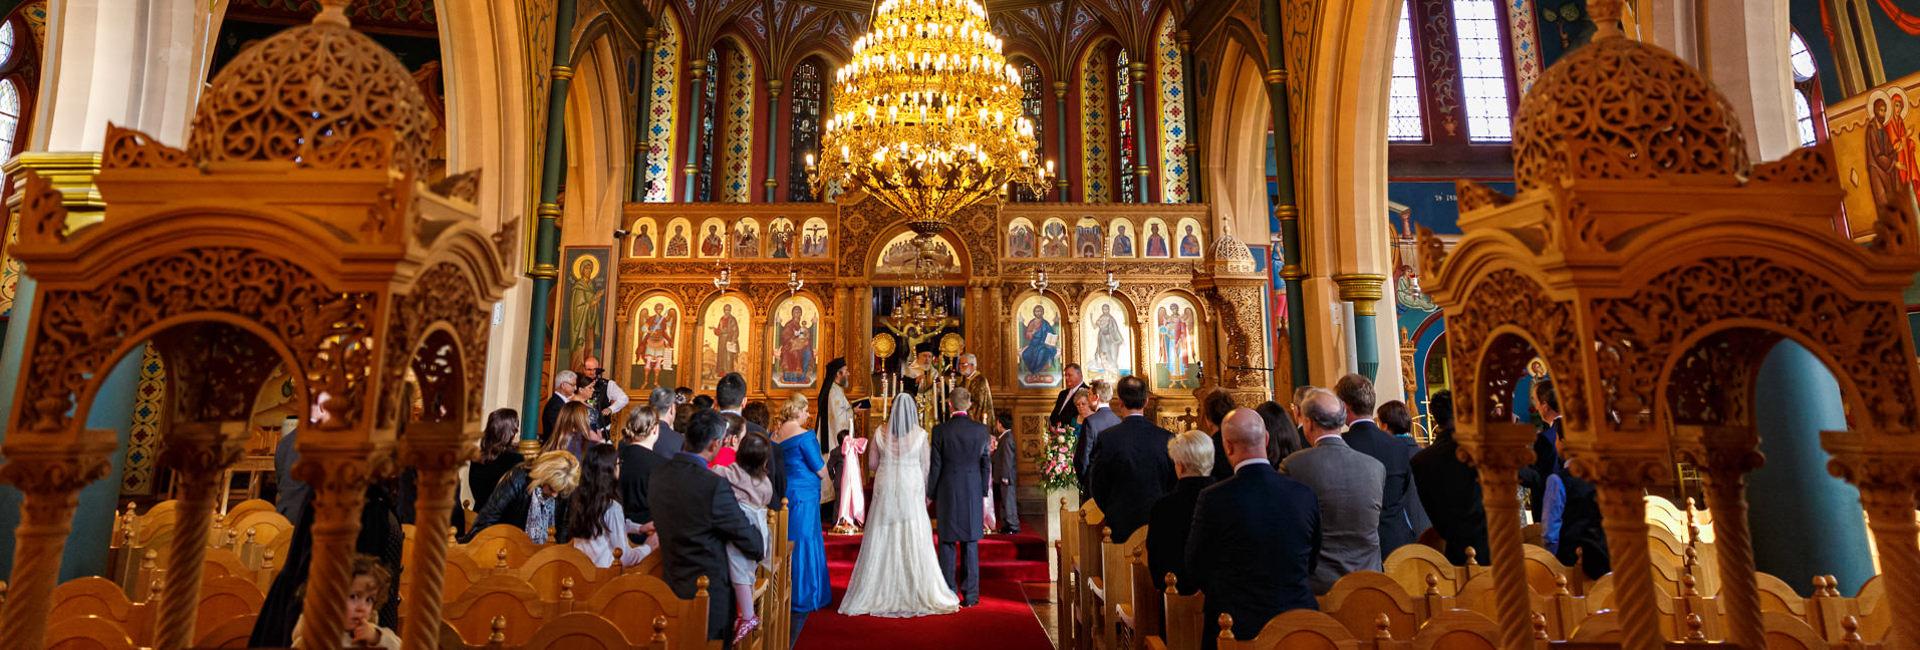 Greek Wedding Photographer London 1